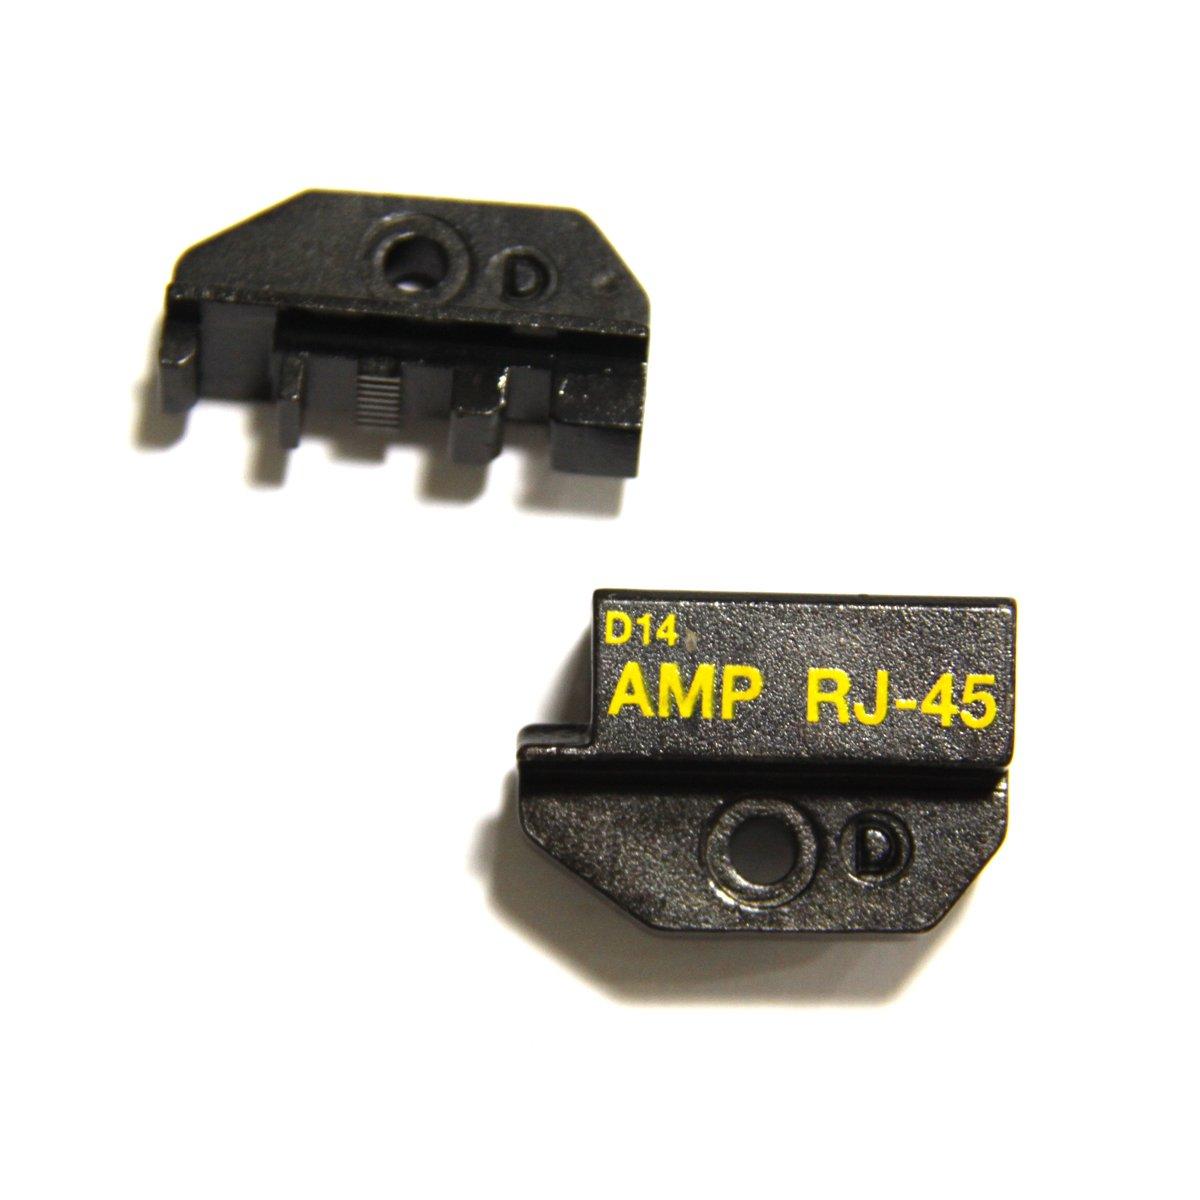 1PK-3003D14 Molde de Alicate para AMP 8P/RJ45 Red Modular Plugs: Amazon.es: Bricolaje y herramientas